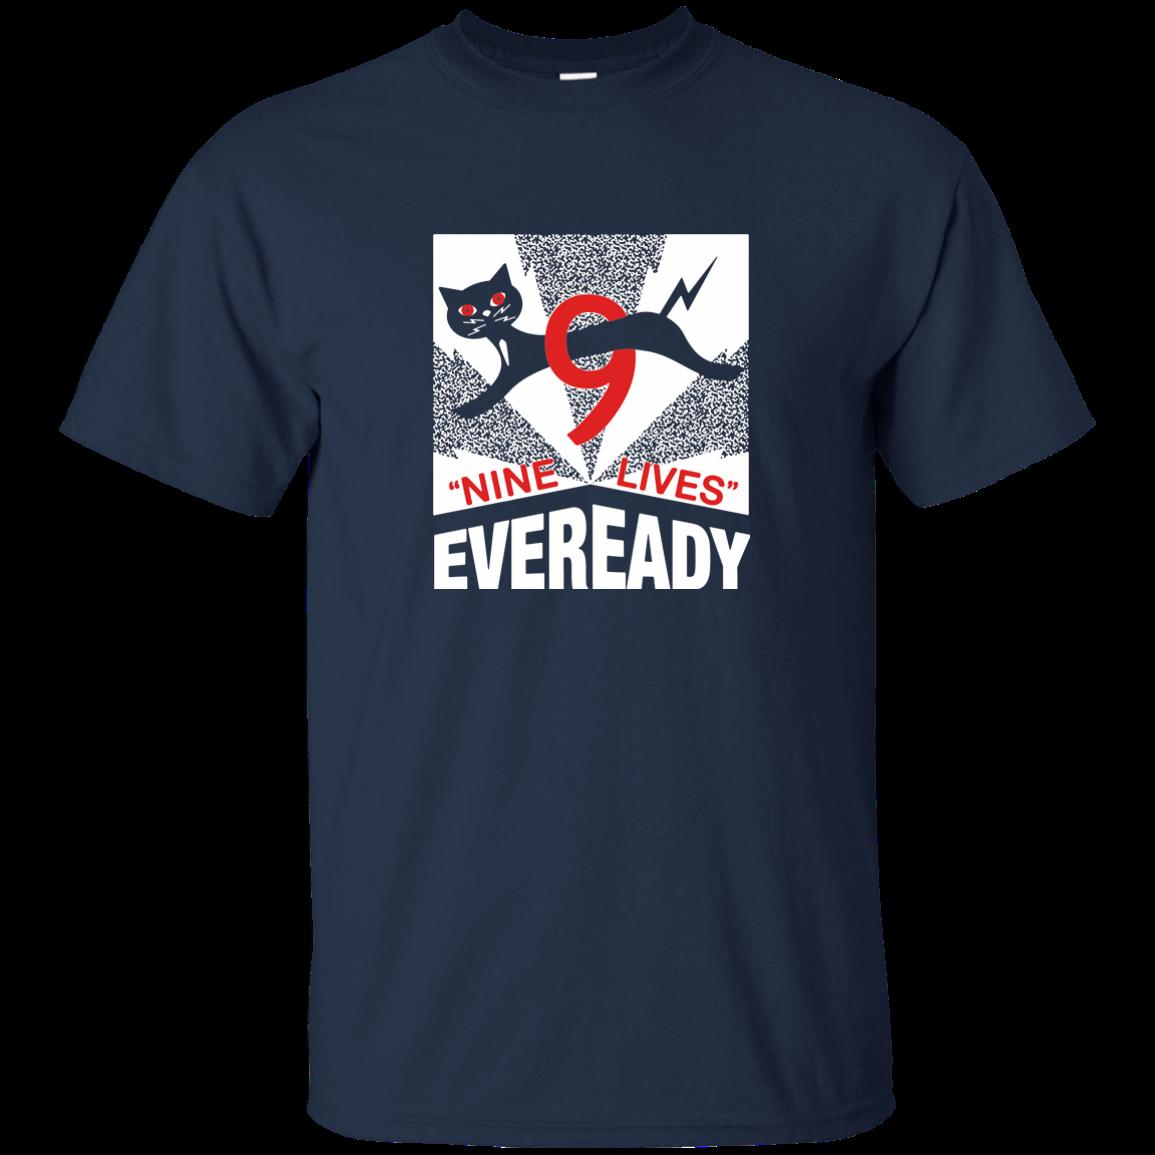 Eveready Baterai Baterai Retro Logo Kucing Hitam Aaa Dd Alcaline 9 Nyawa Streetwear T Shirt Aliexpress